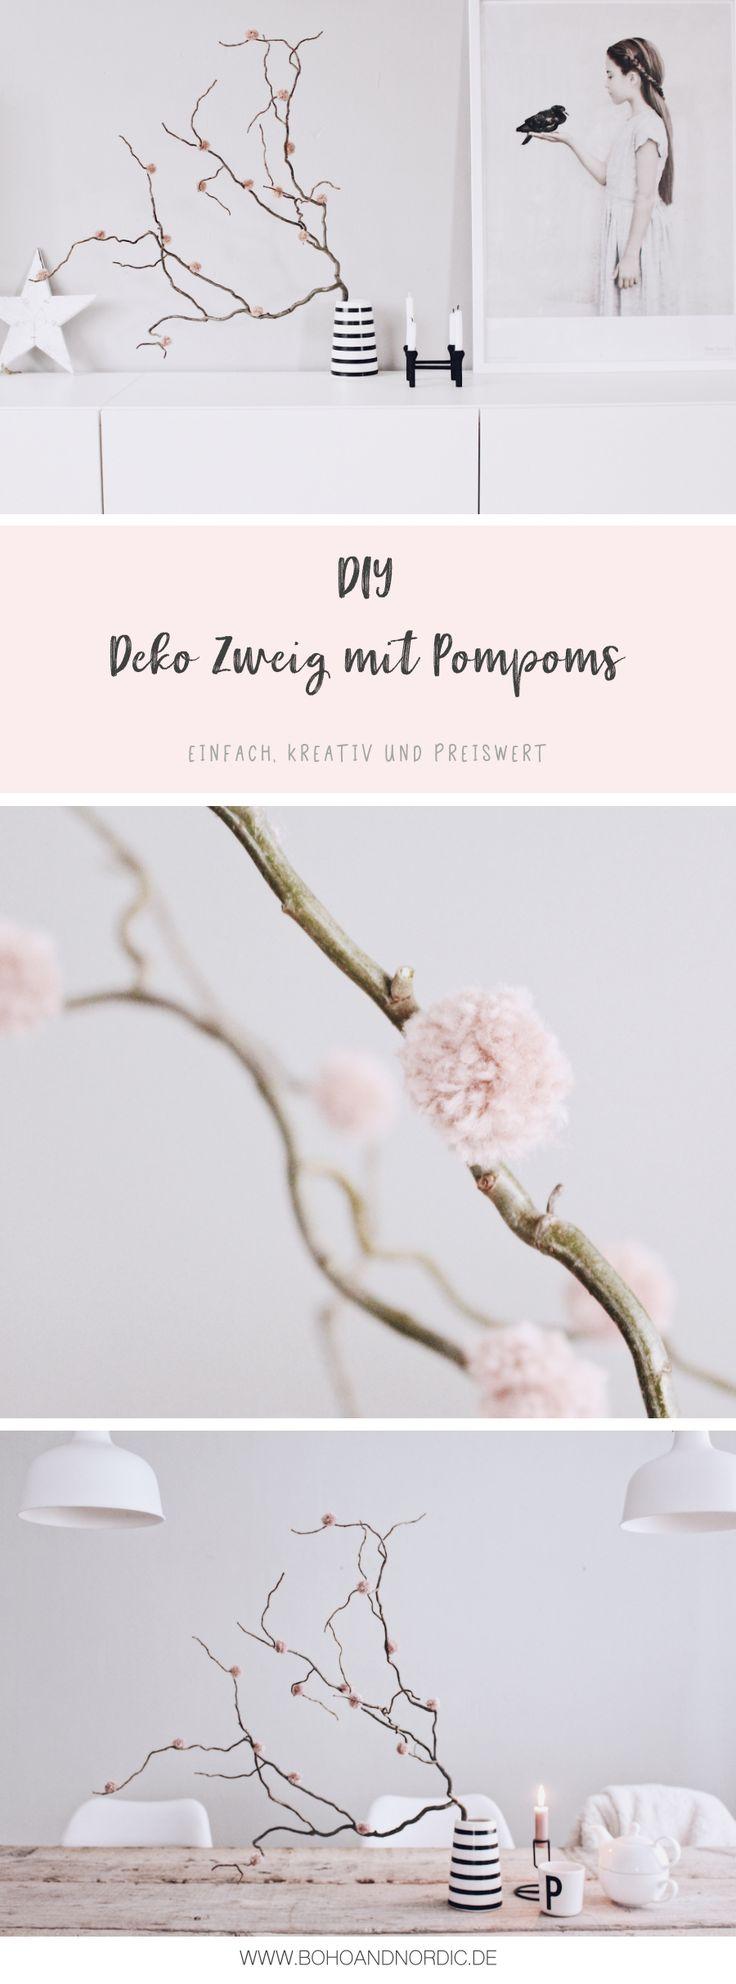 DIY Deko mit Pompoms – Ines Tyrell